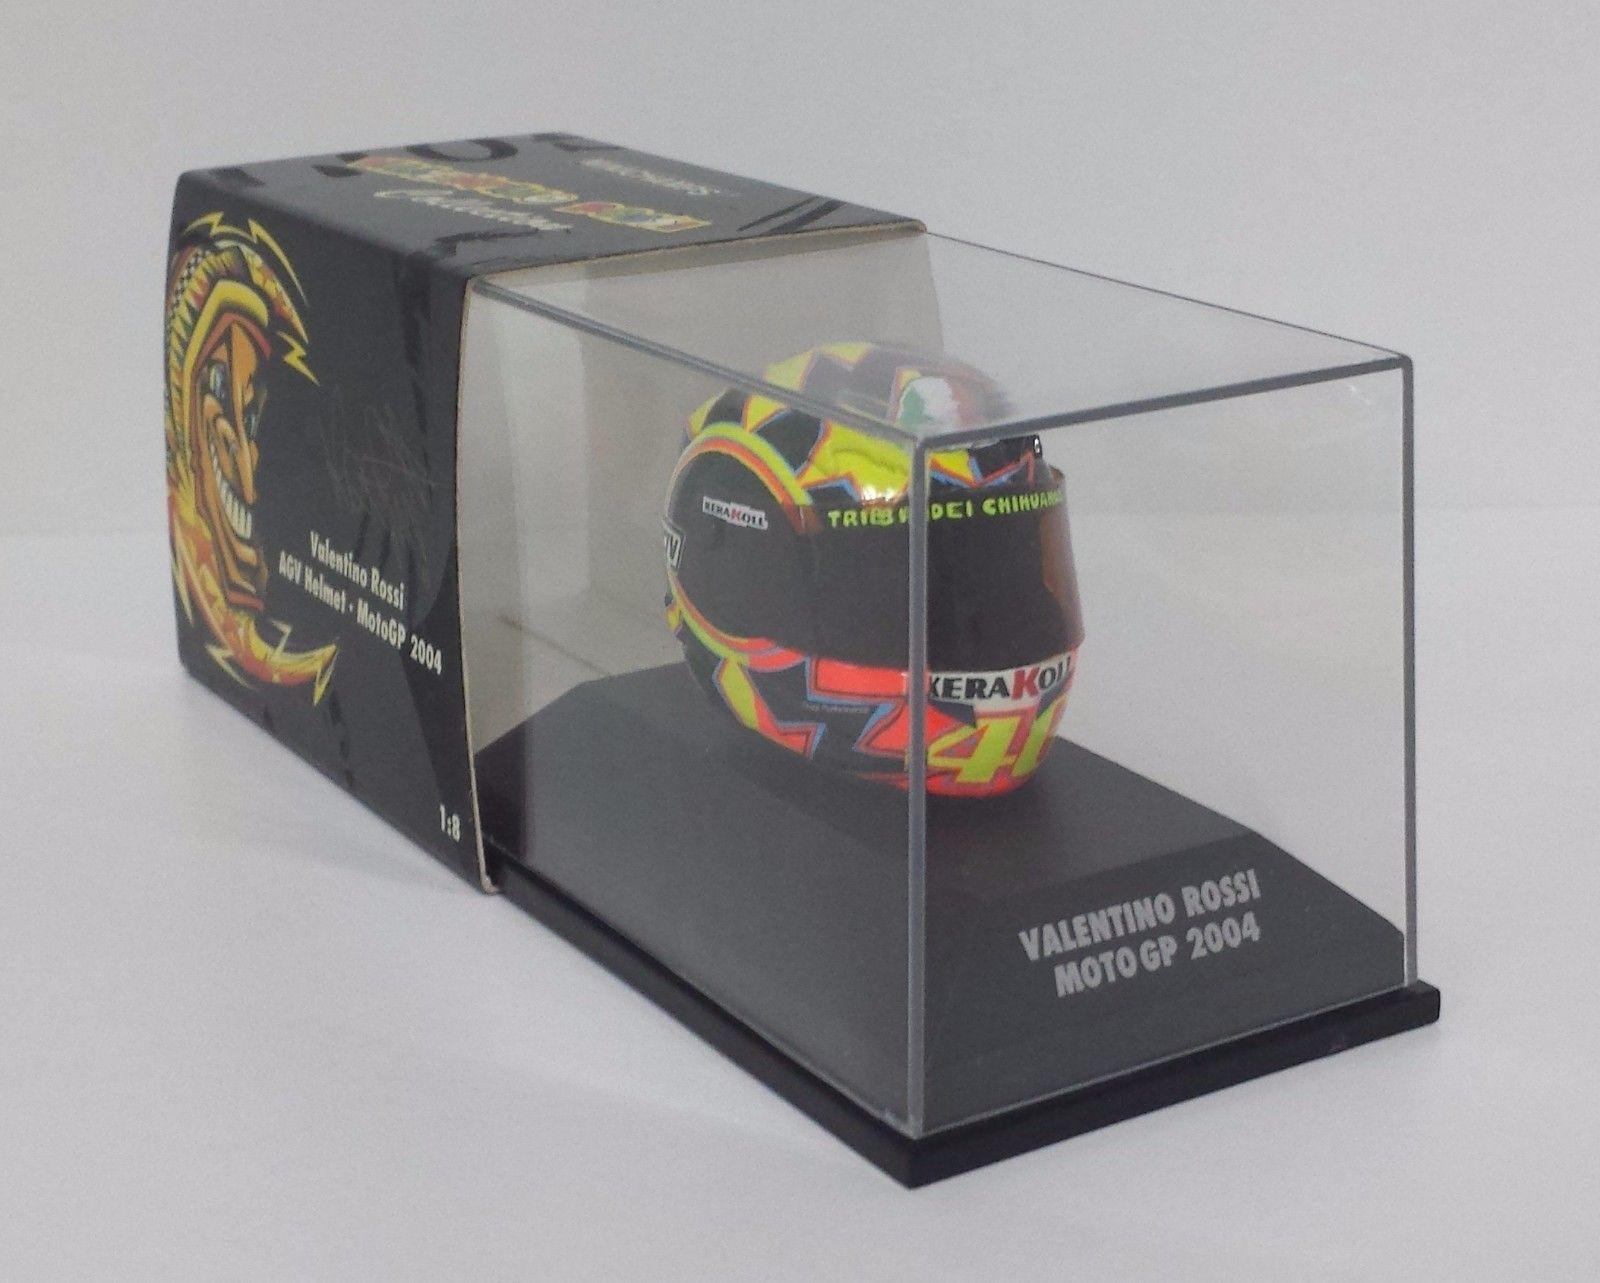 MINICHAMPS VALENTINO ROSSI MODELLINO AGV CASCO HELMET 1/8 MOTO GP 2004 NEW RARE